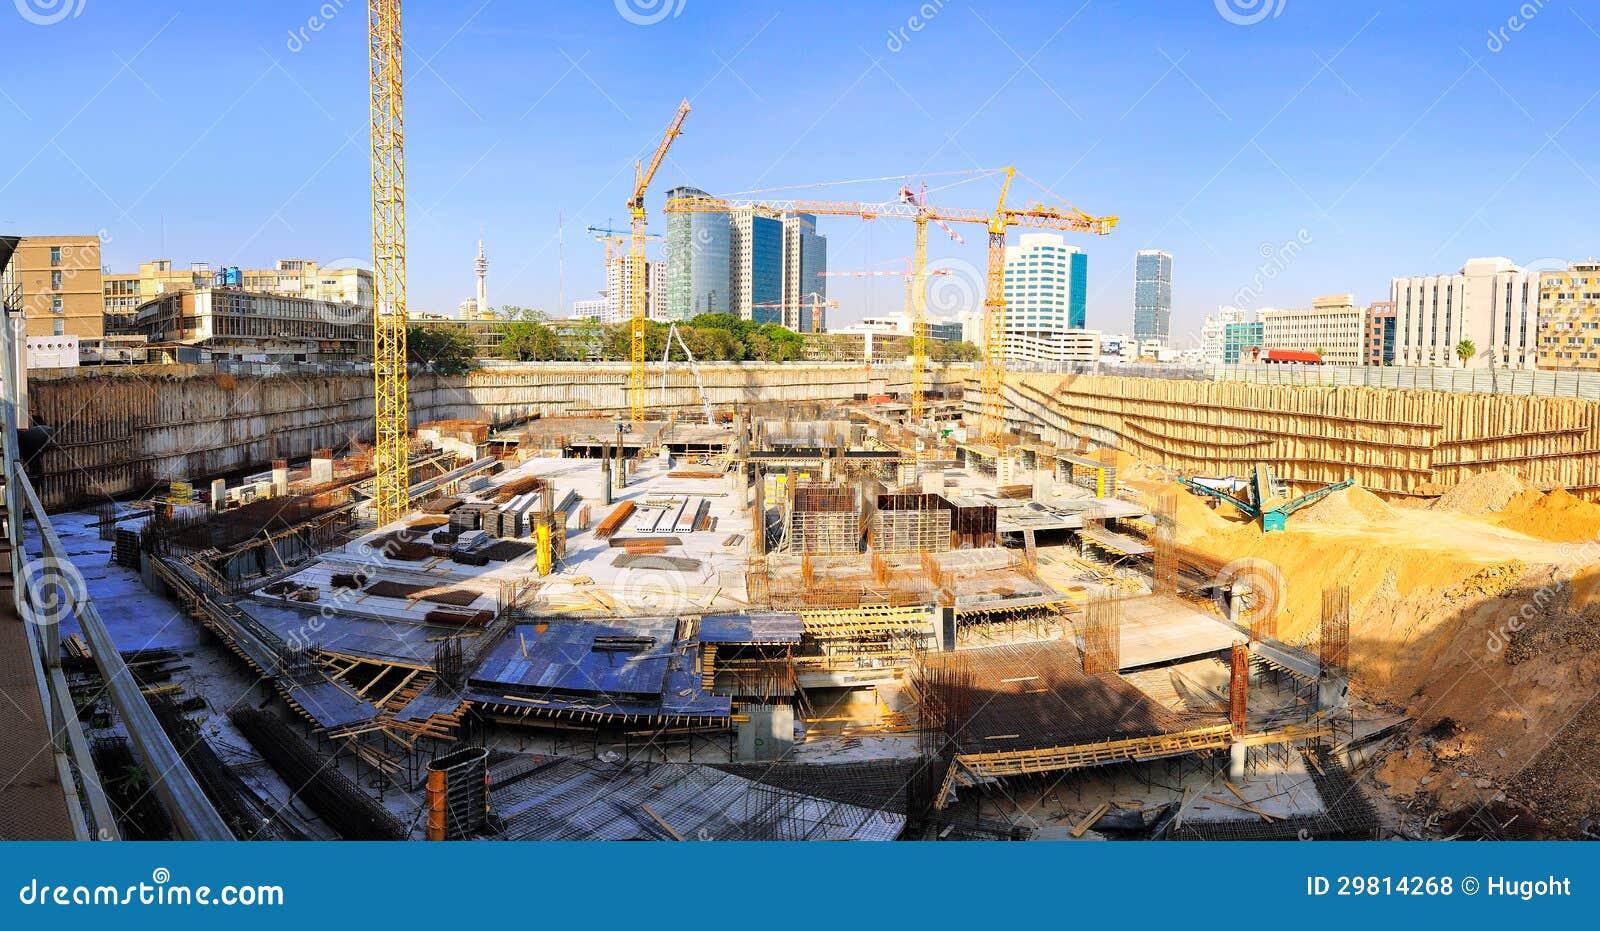 Grues de chantier de construction photo stock image for Chantiers de construction